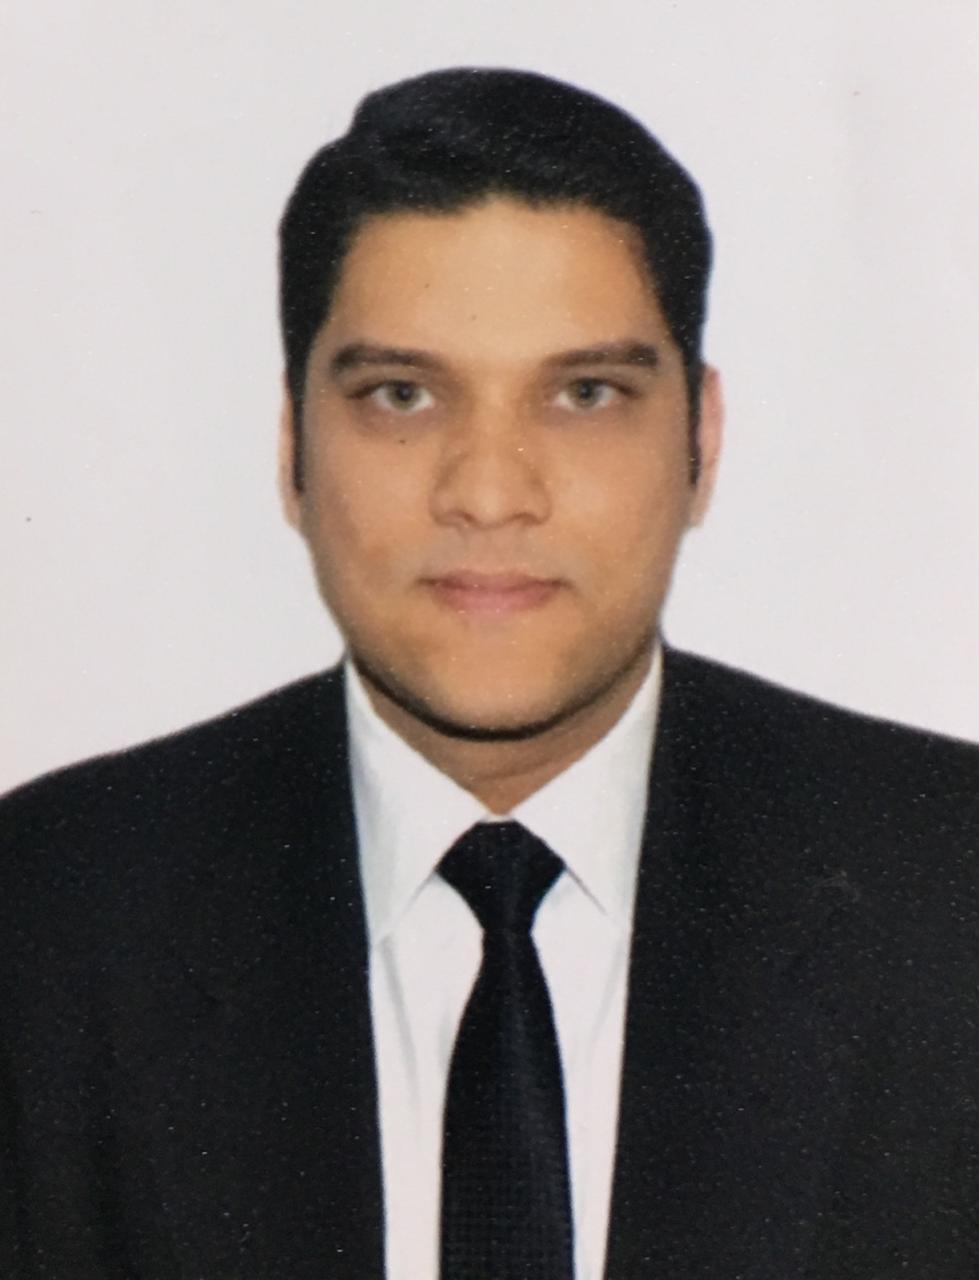 Advocate Vishal Mehta